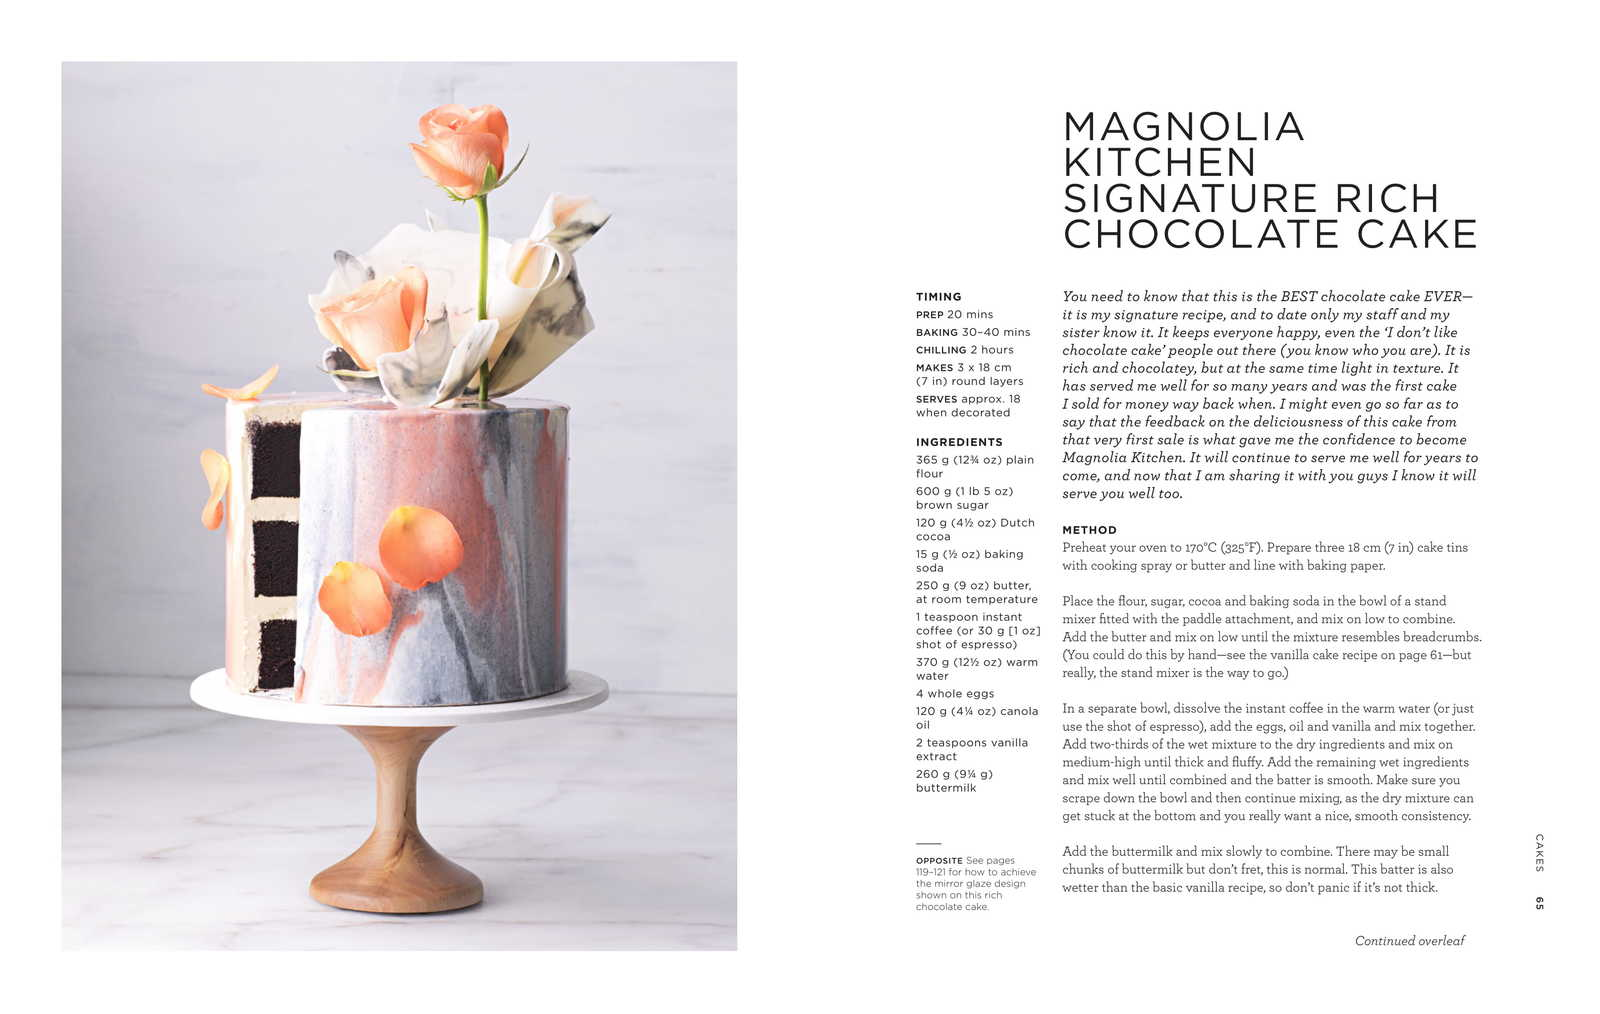 Magnolia Kitchen by Bernadette Gee image